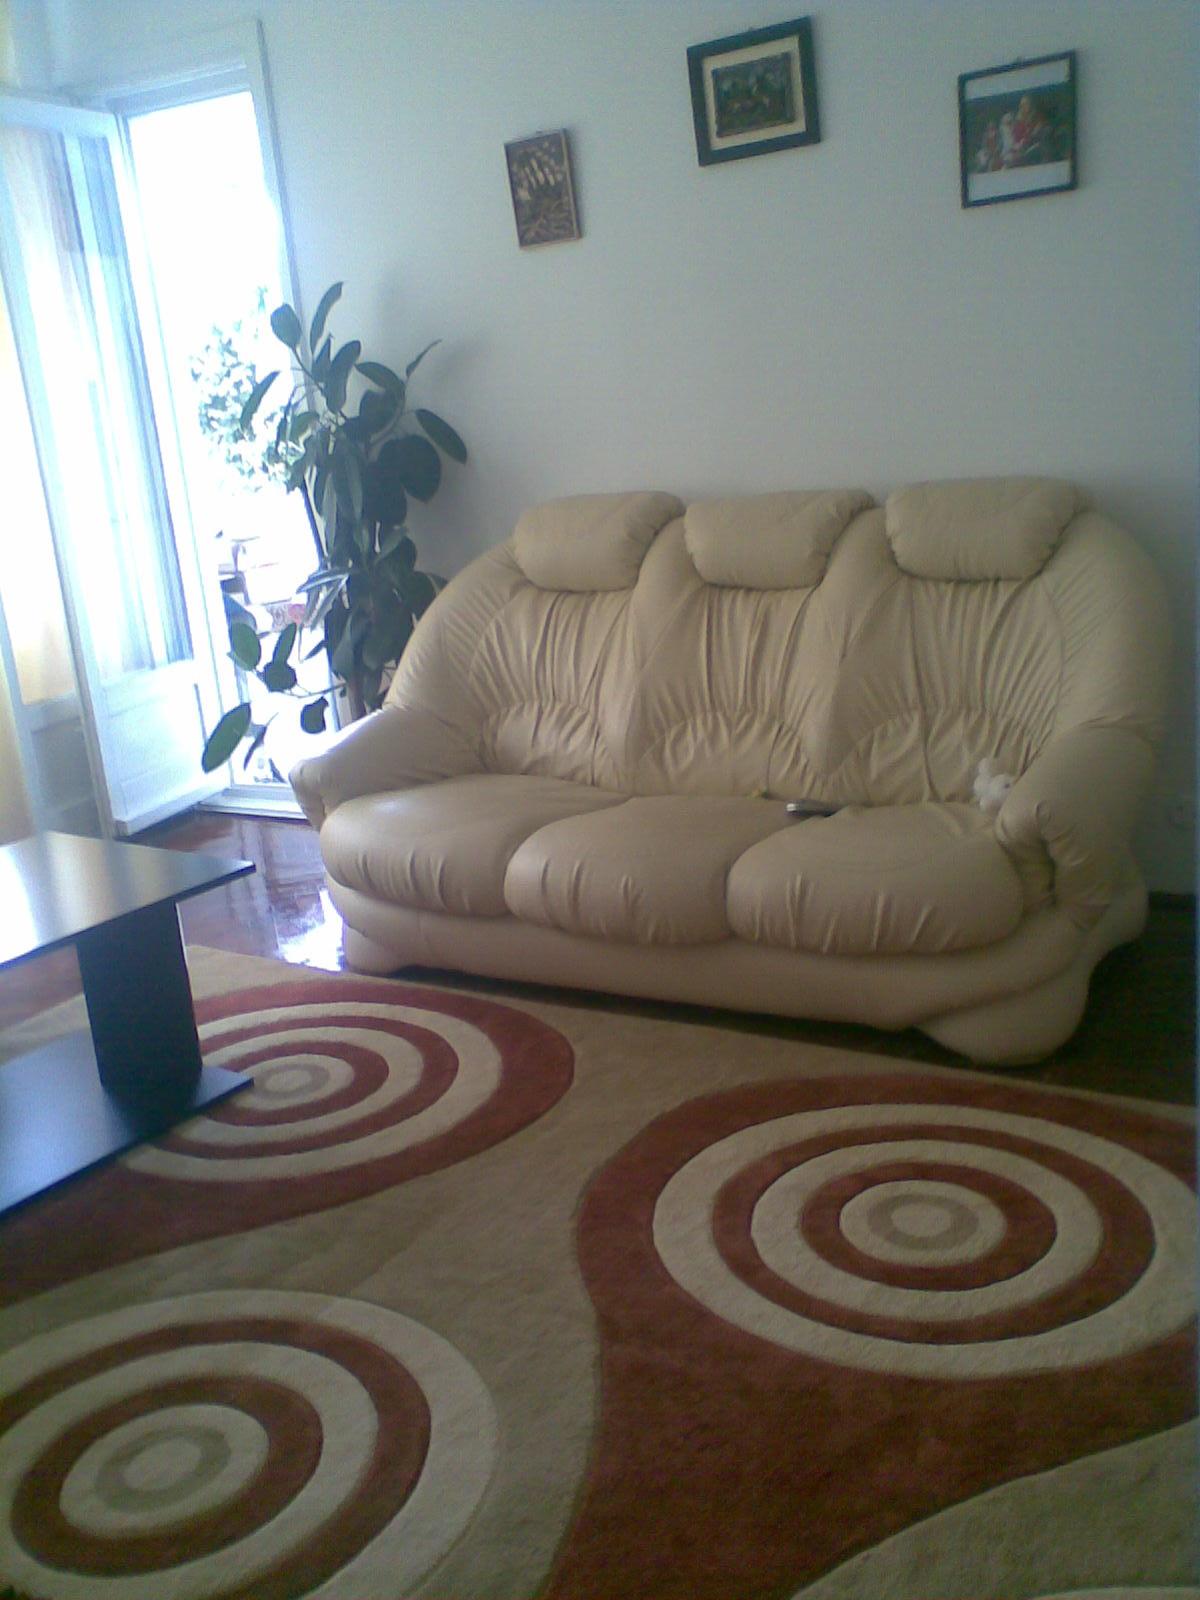 Vand apartament 2 camere in bucurestii noi